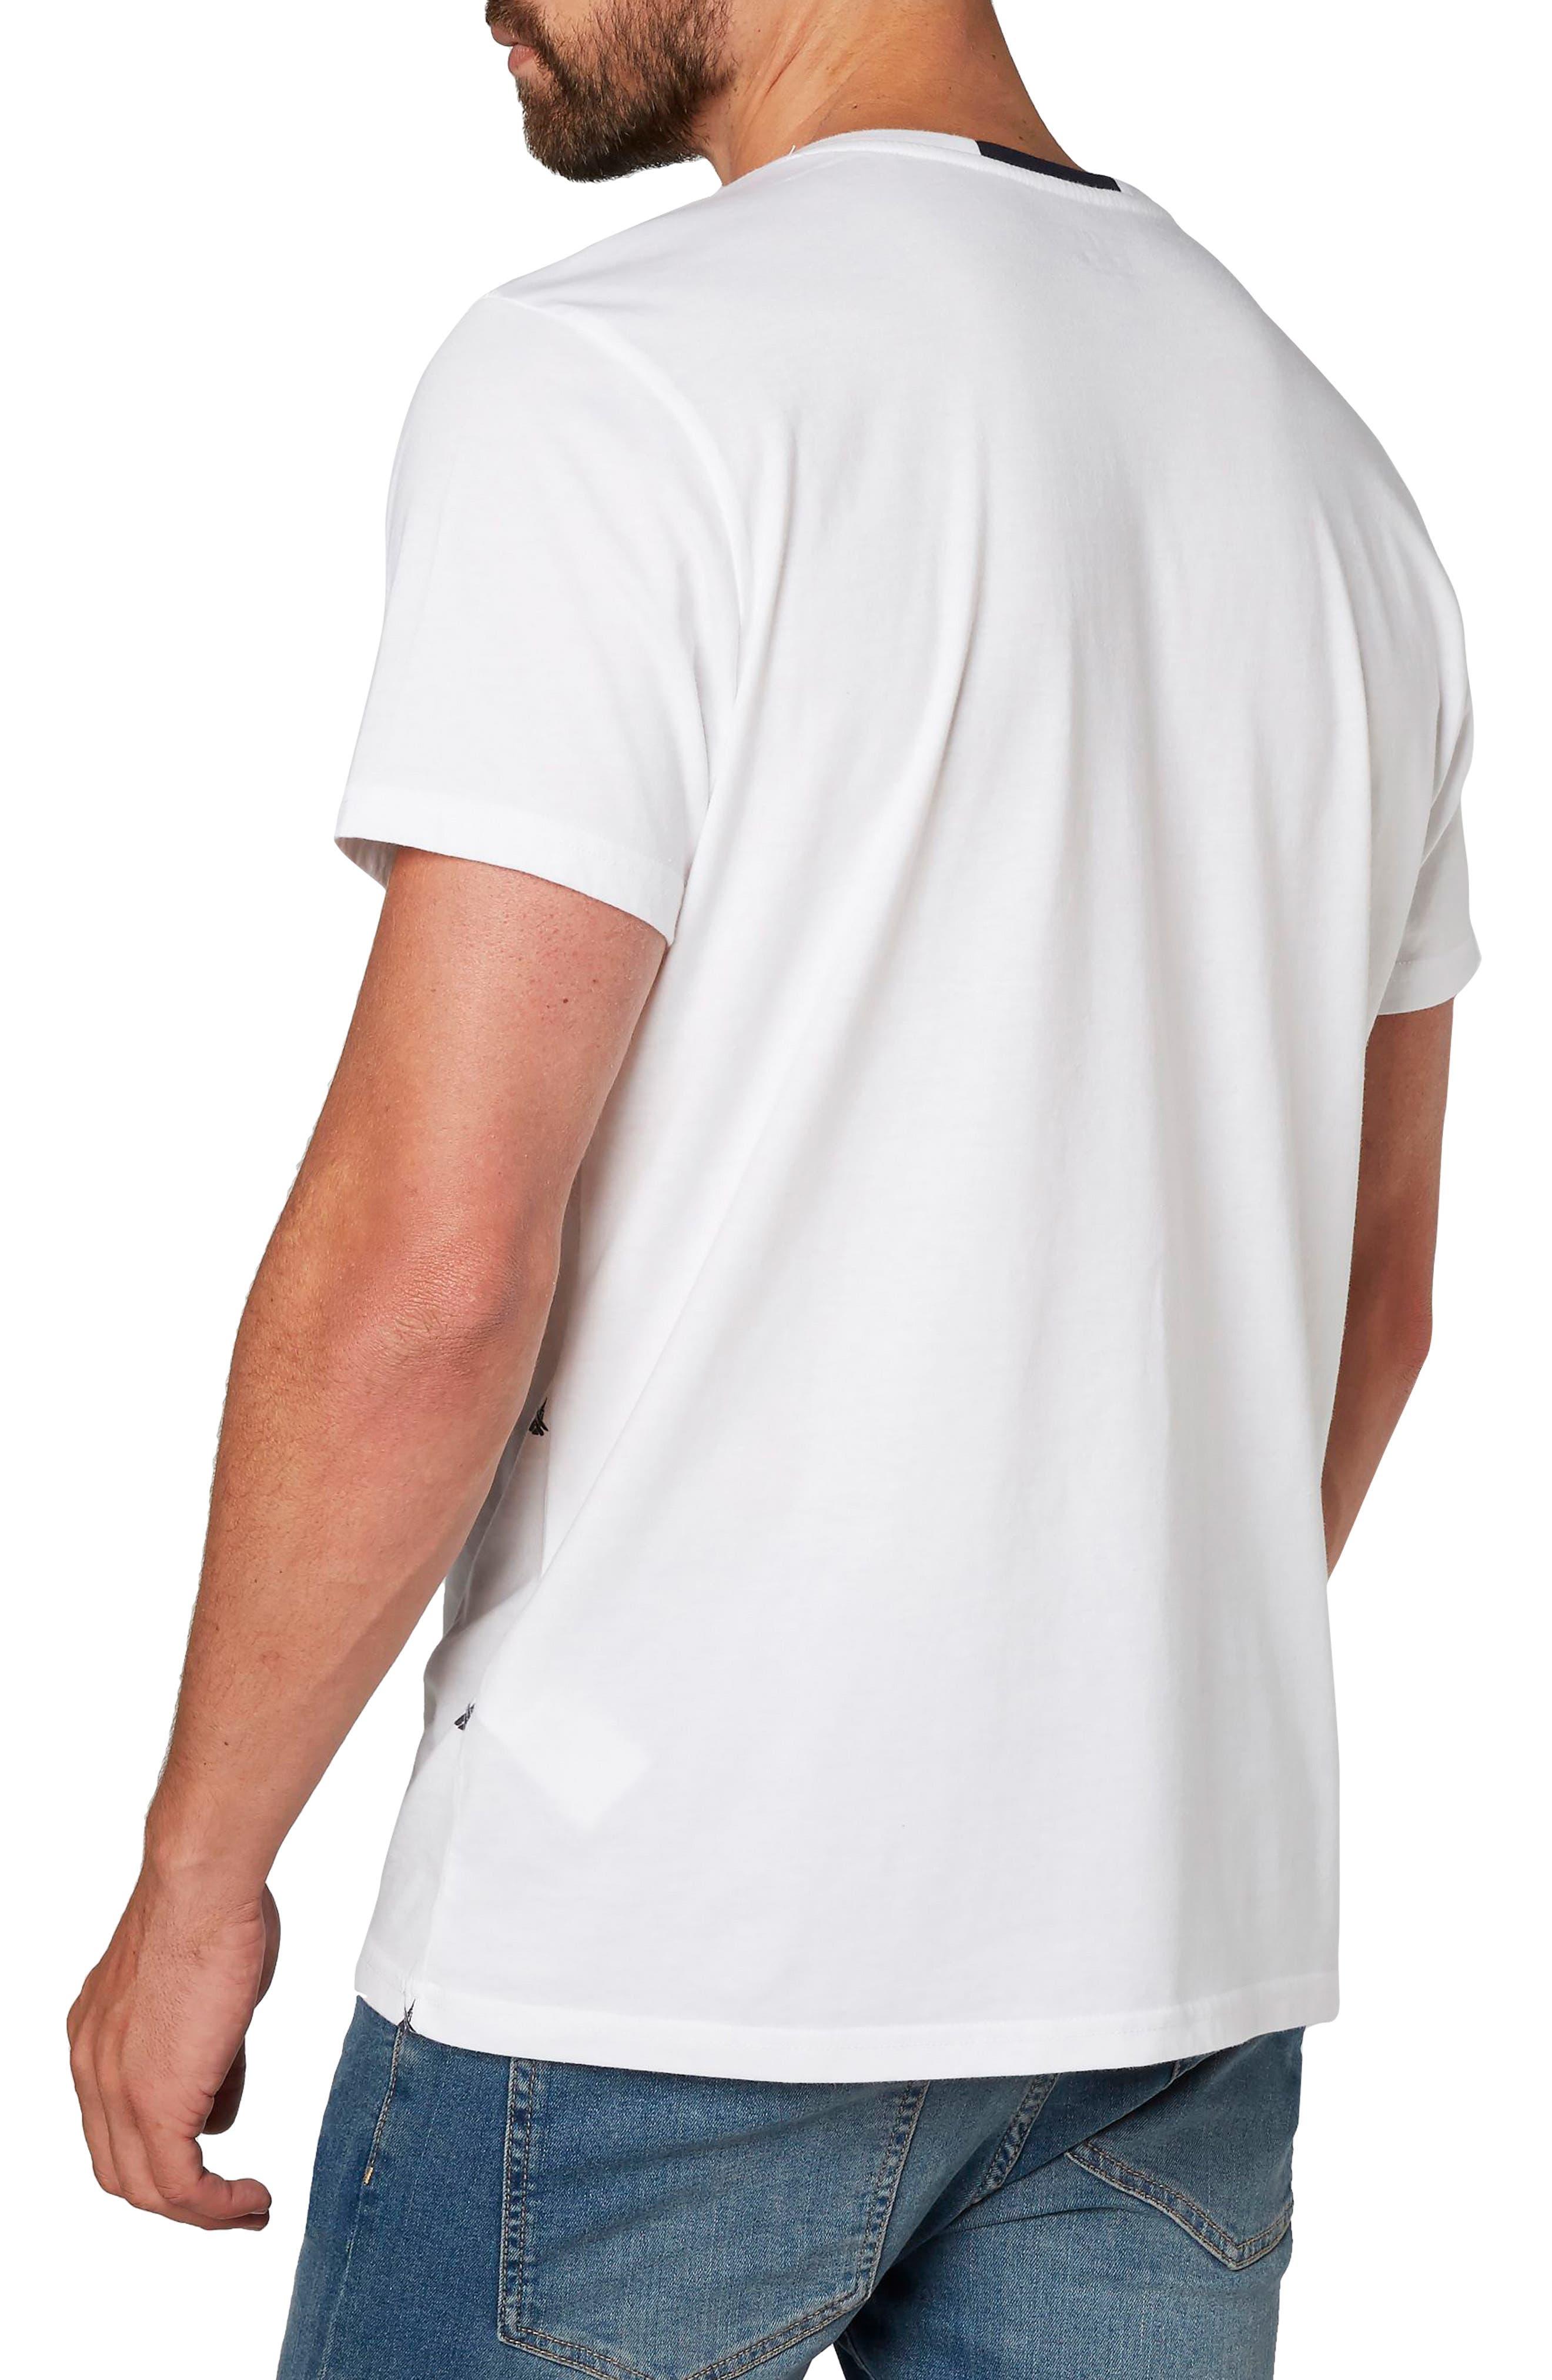 Fjord Cotton Blend T-Shirt,                             Alternate thumbnail 2, color,                             100